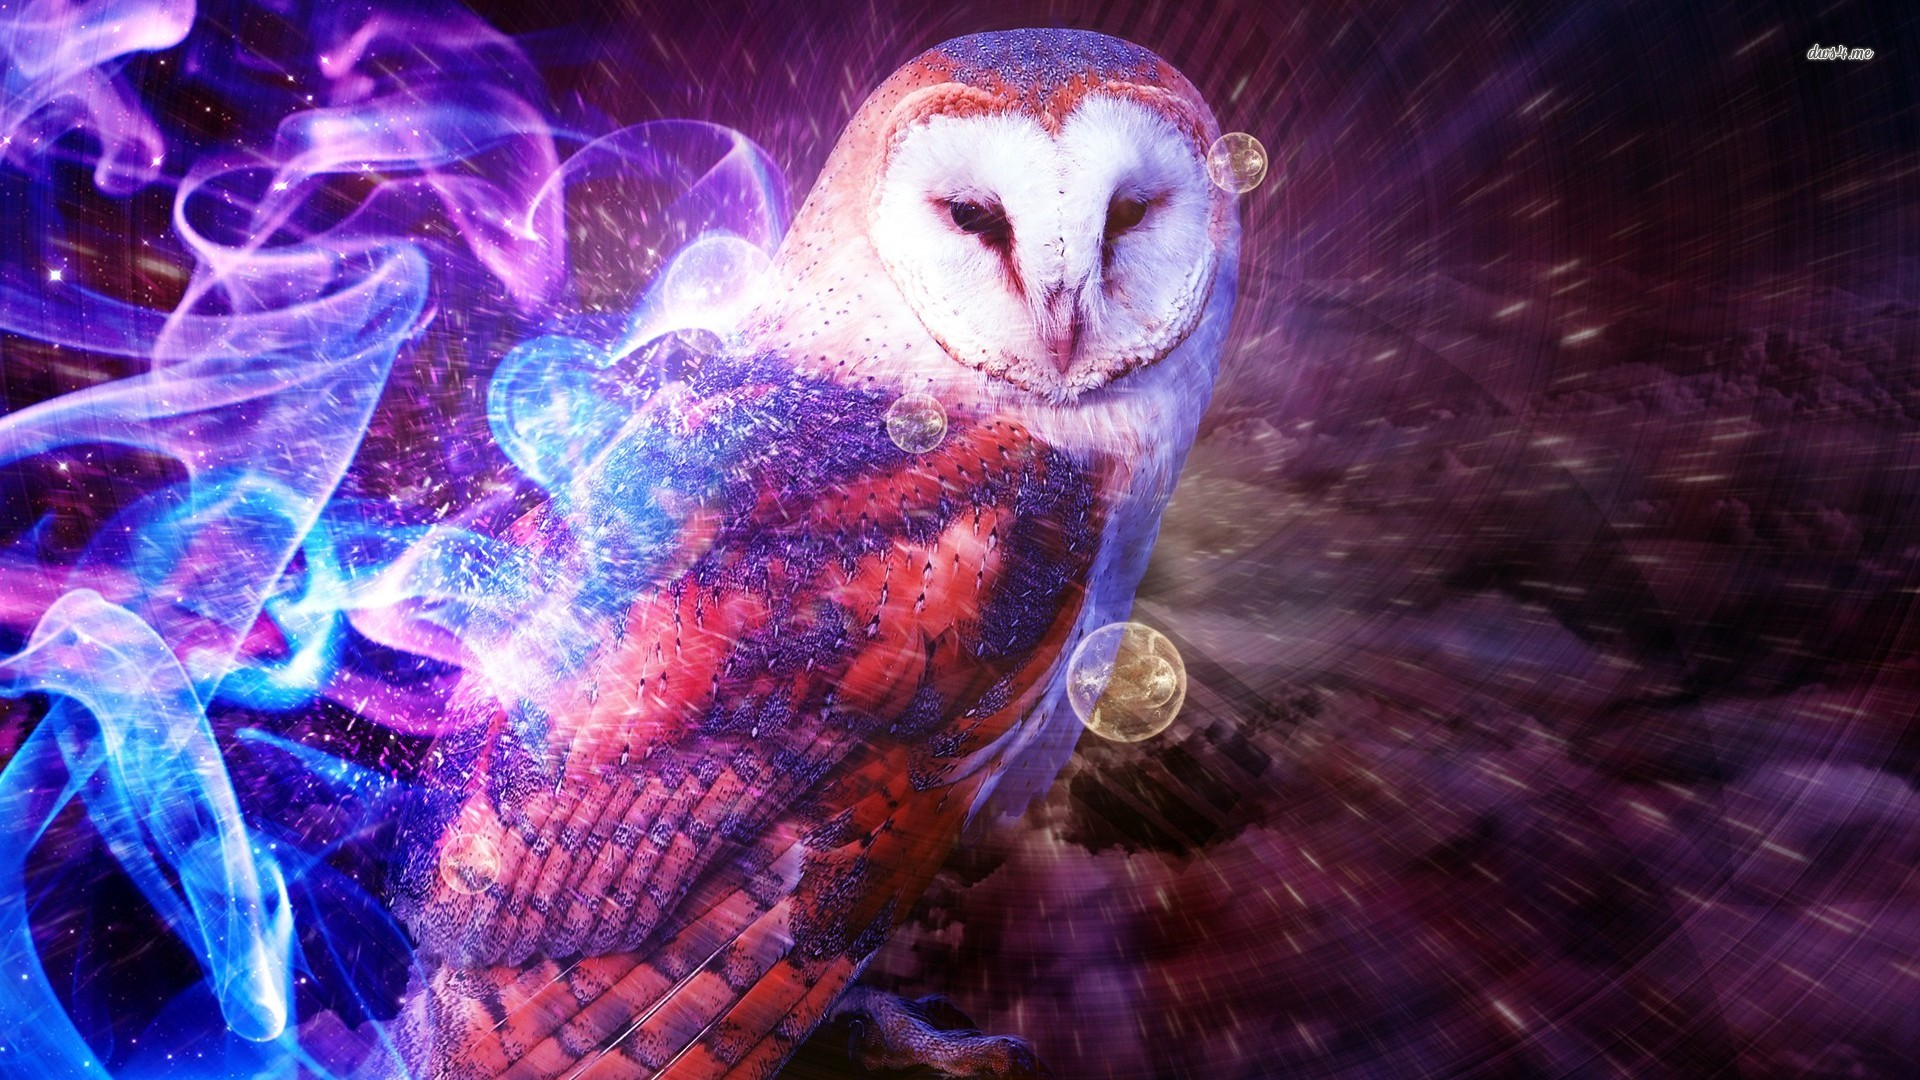 Owl Wallpaper Fantasy Colorful Owl Art 115013 Hd Wallpaper Backgrounds Download